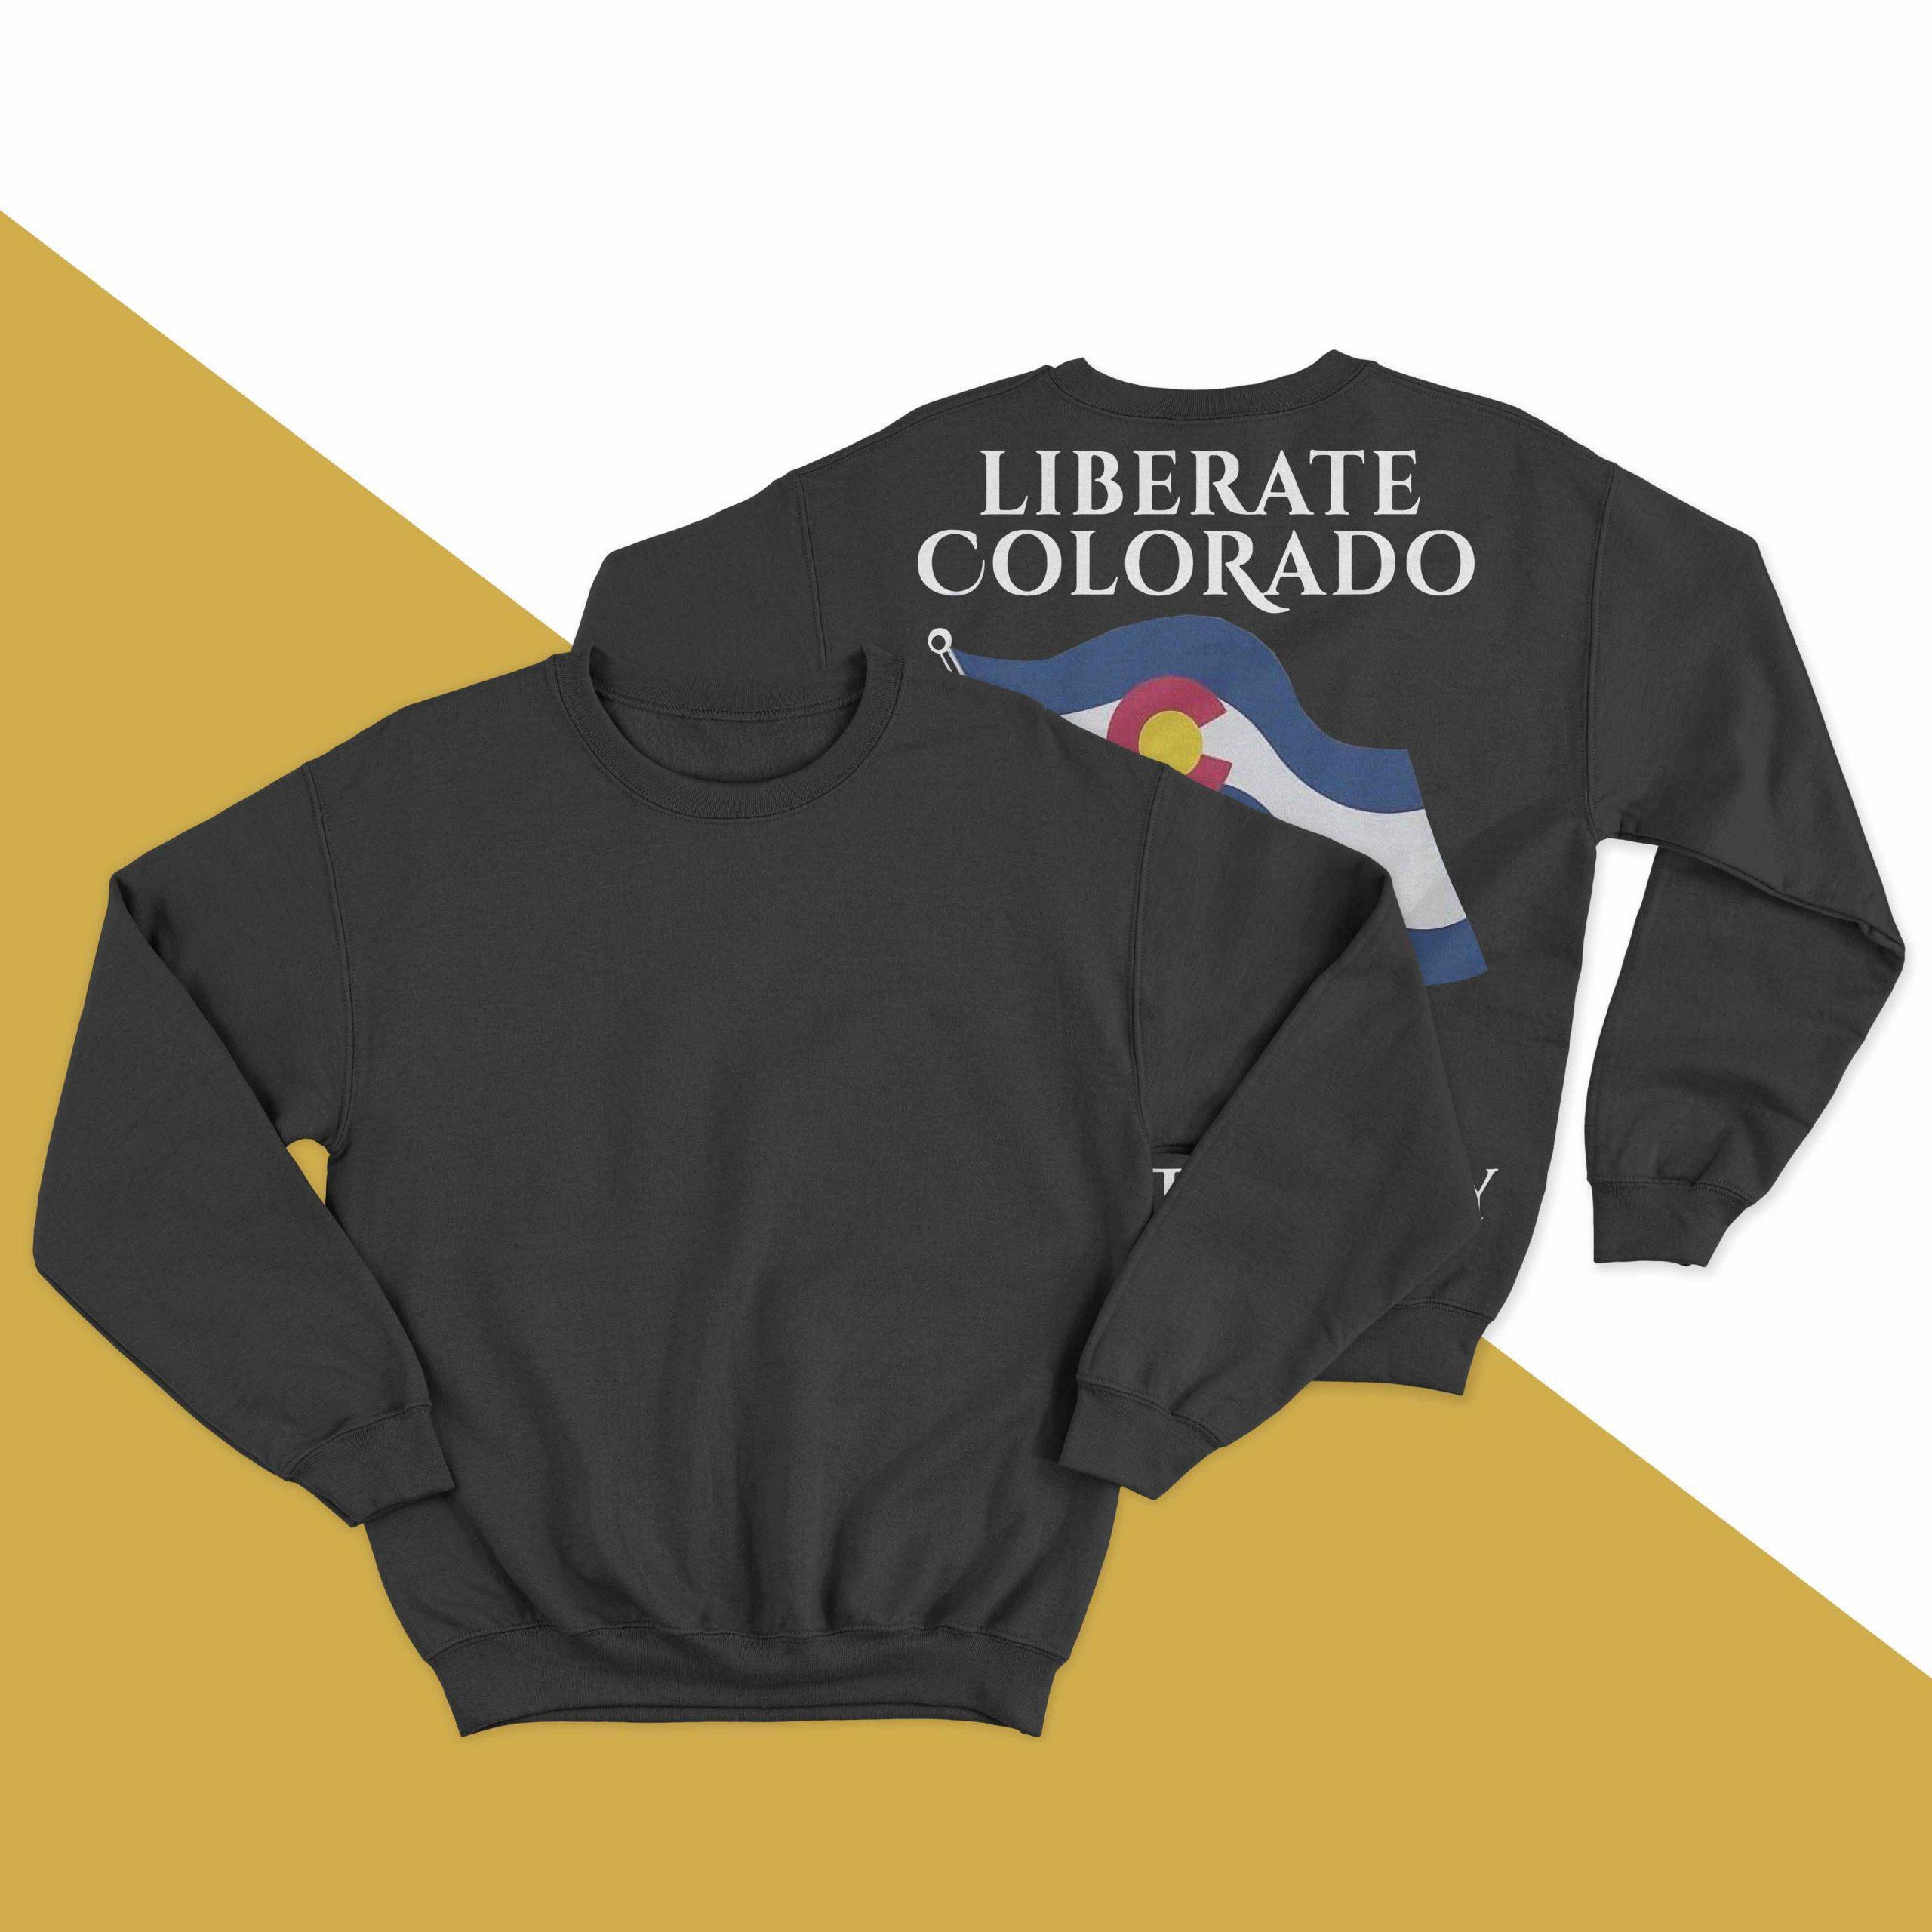 Liberate Colorado Resist Tyranny Longsleeve